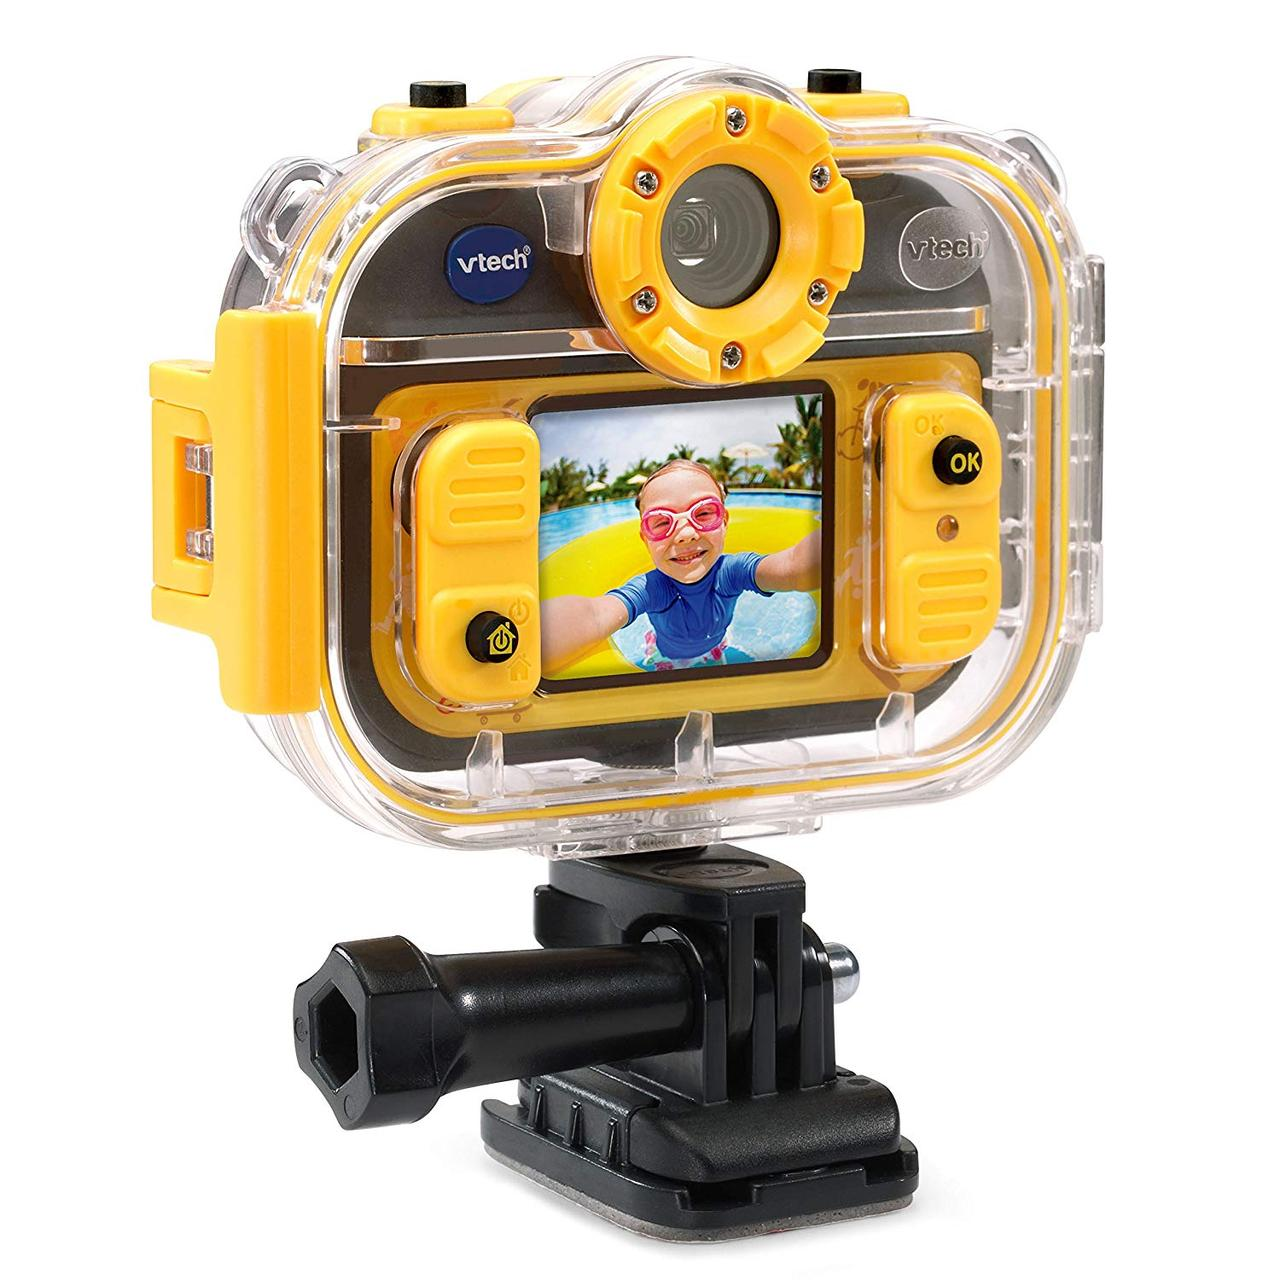 Фото- и видео- камера VTech Kidizoom Action Cam 180 уценка